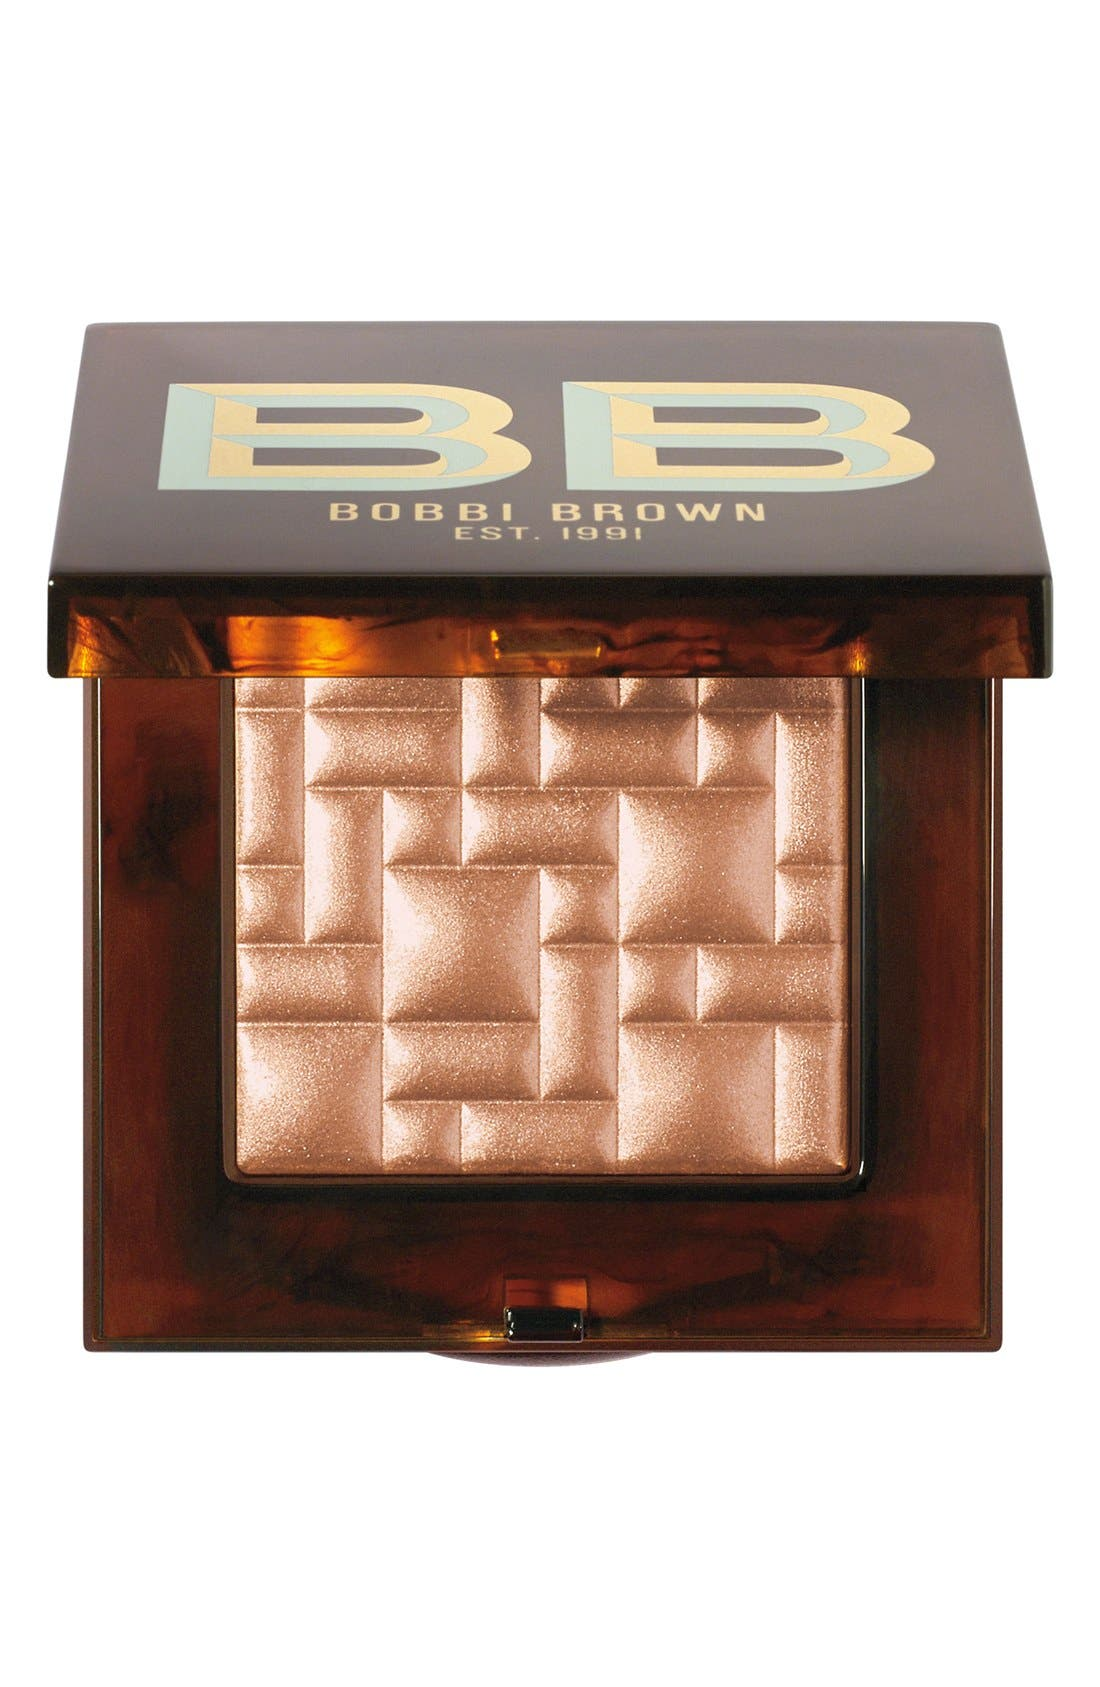 BOBBI BROWN, 'Scotch on the Rocks' Highlight Powder, Main thumbnail 1, color, 220